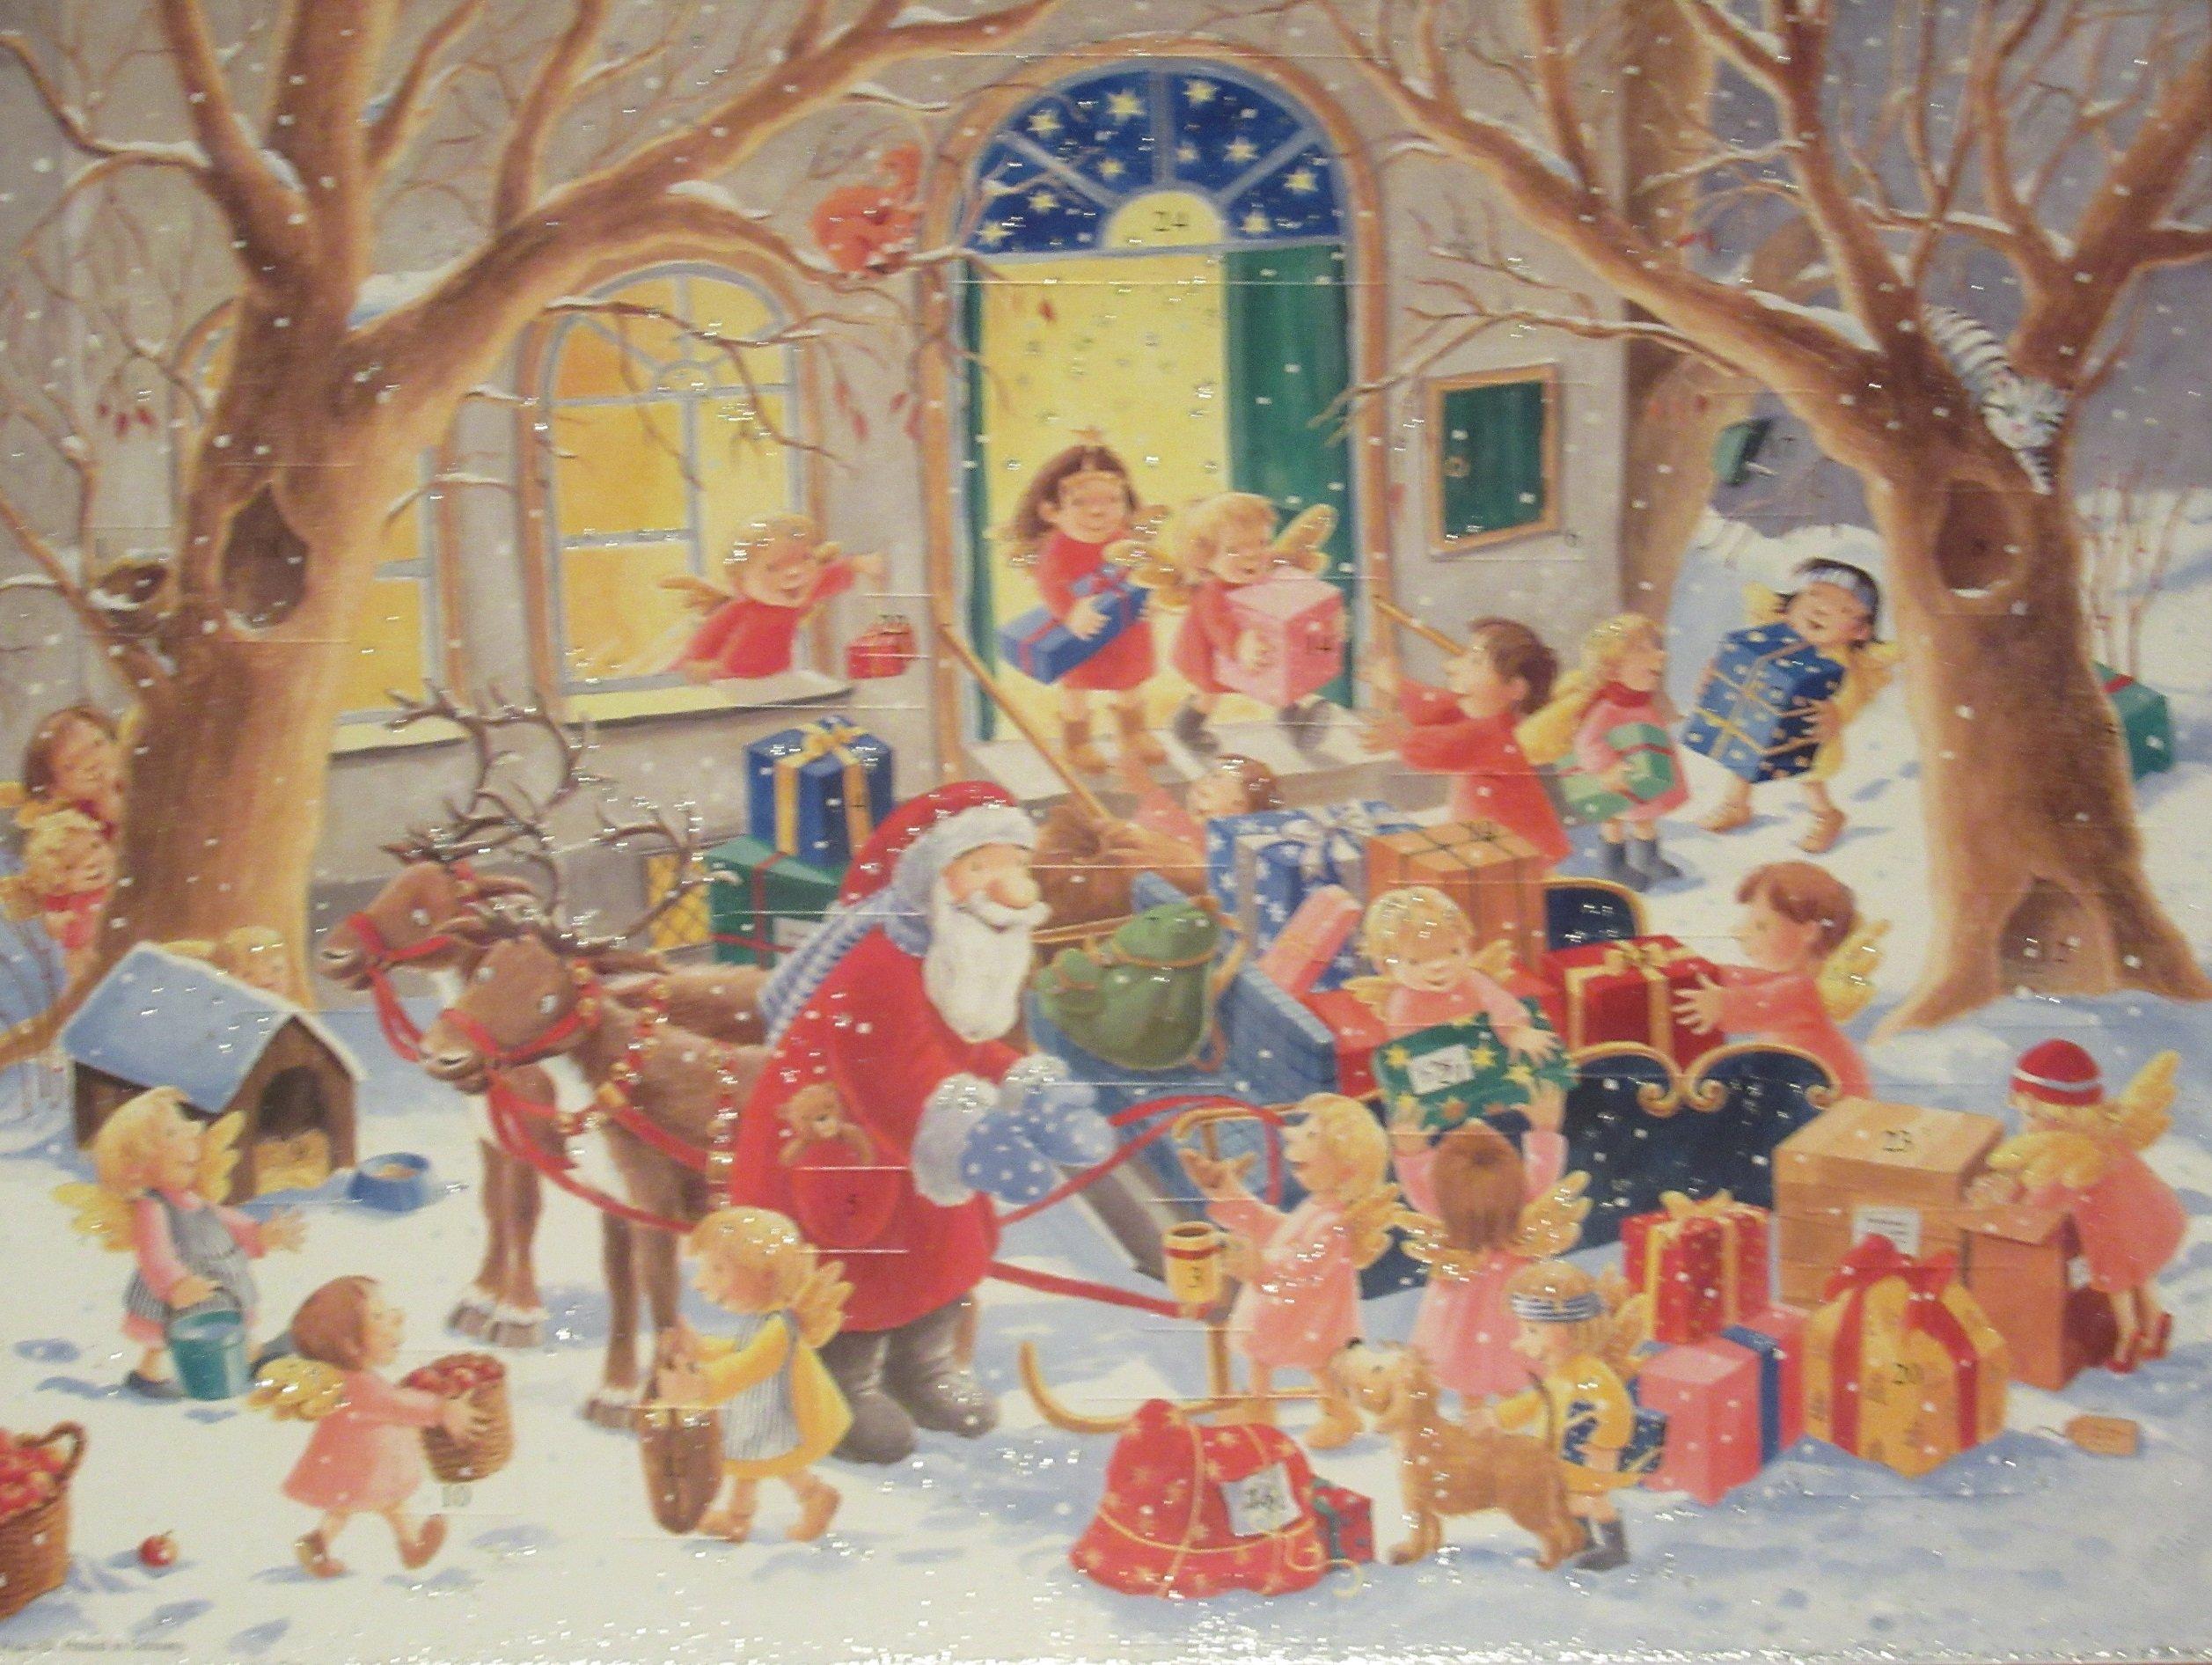 Adventskalender, Engel helfen Nikolaus